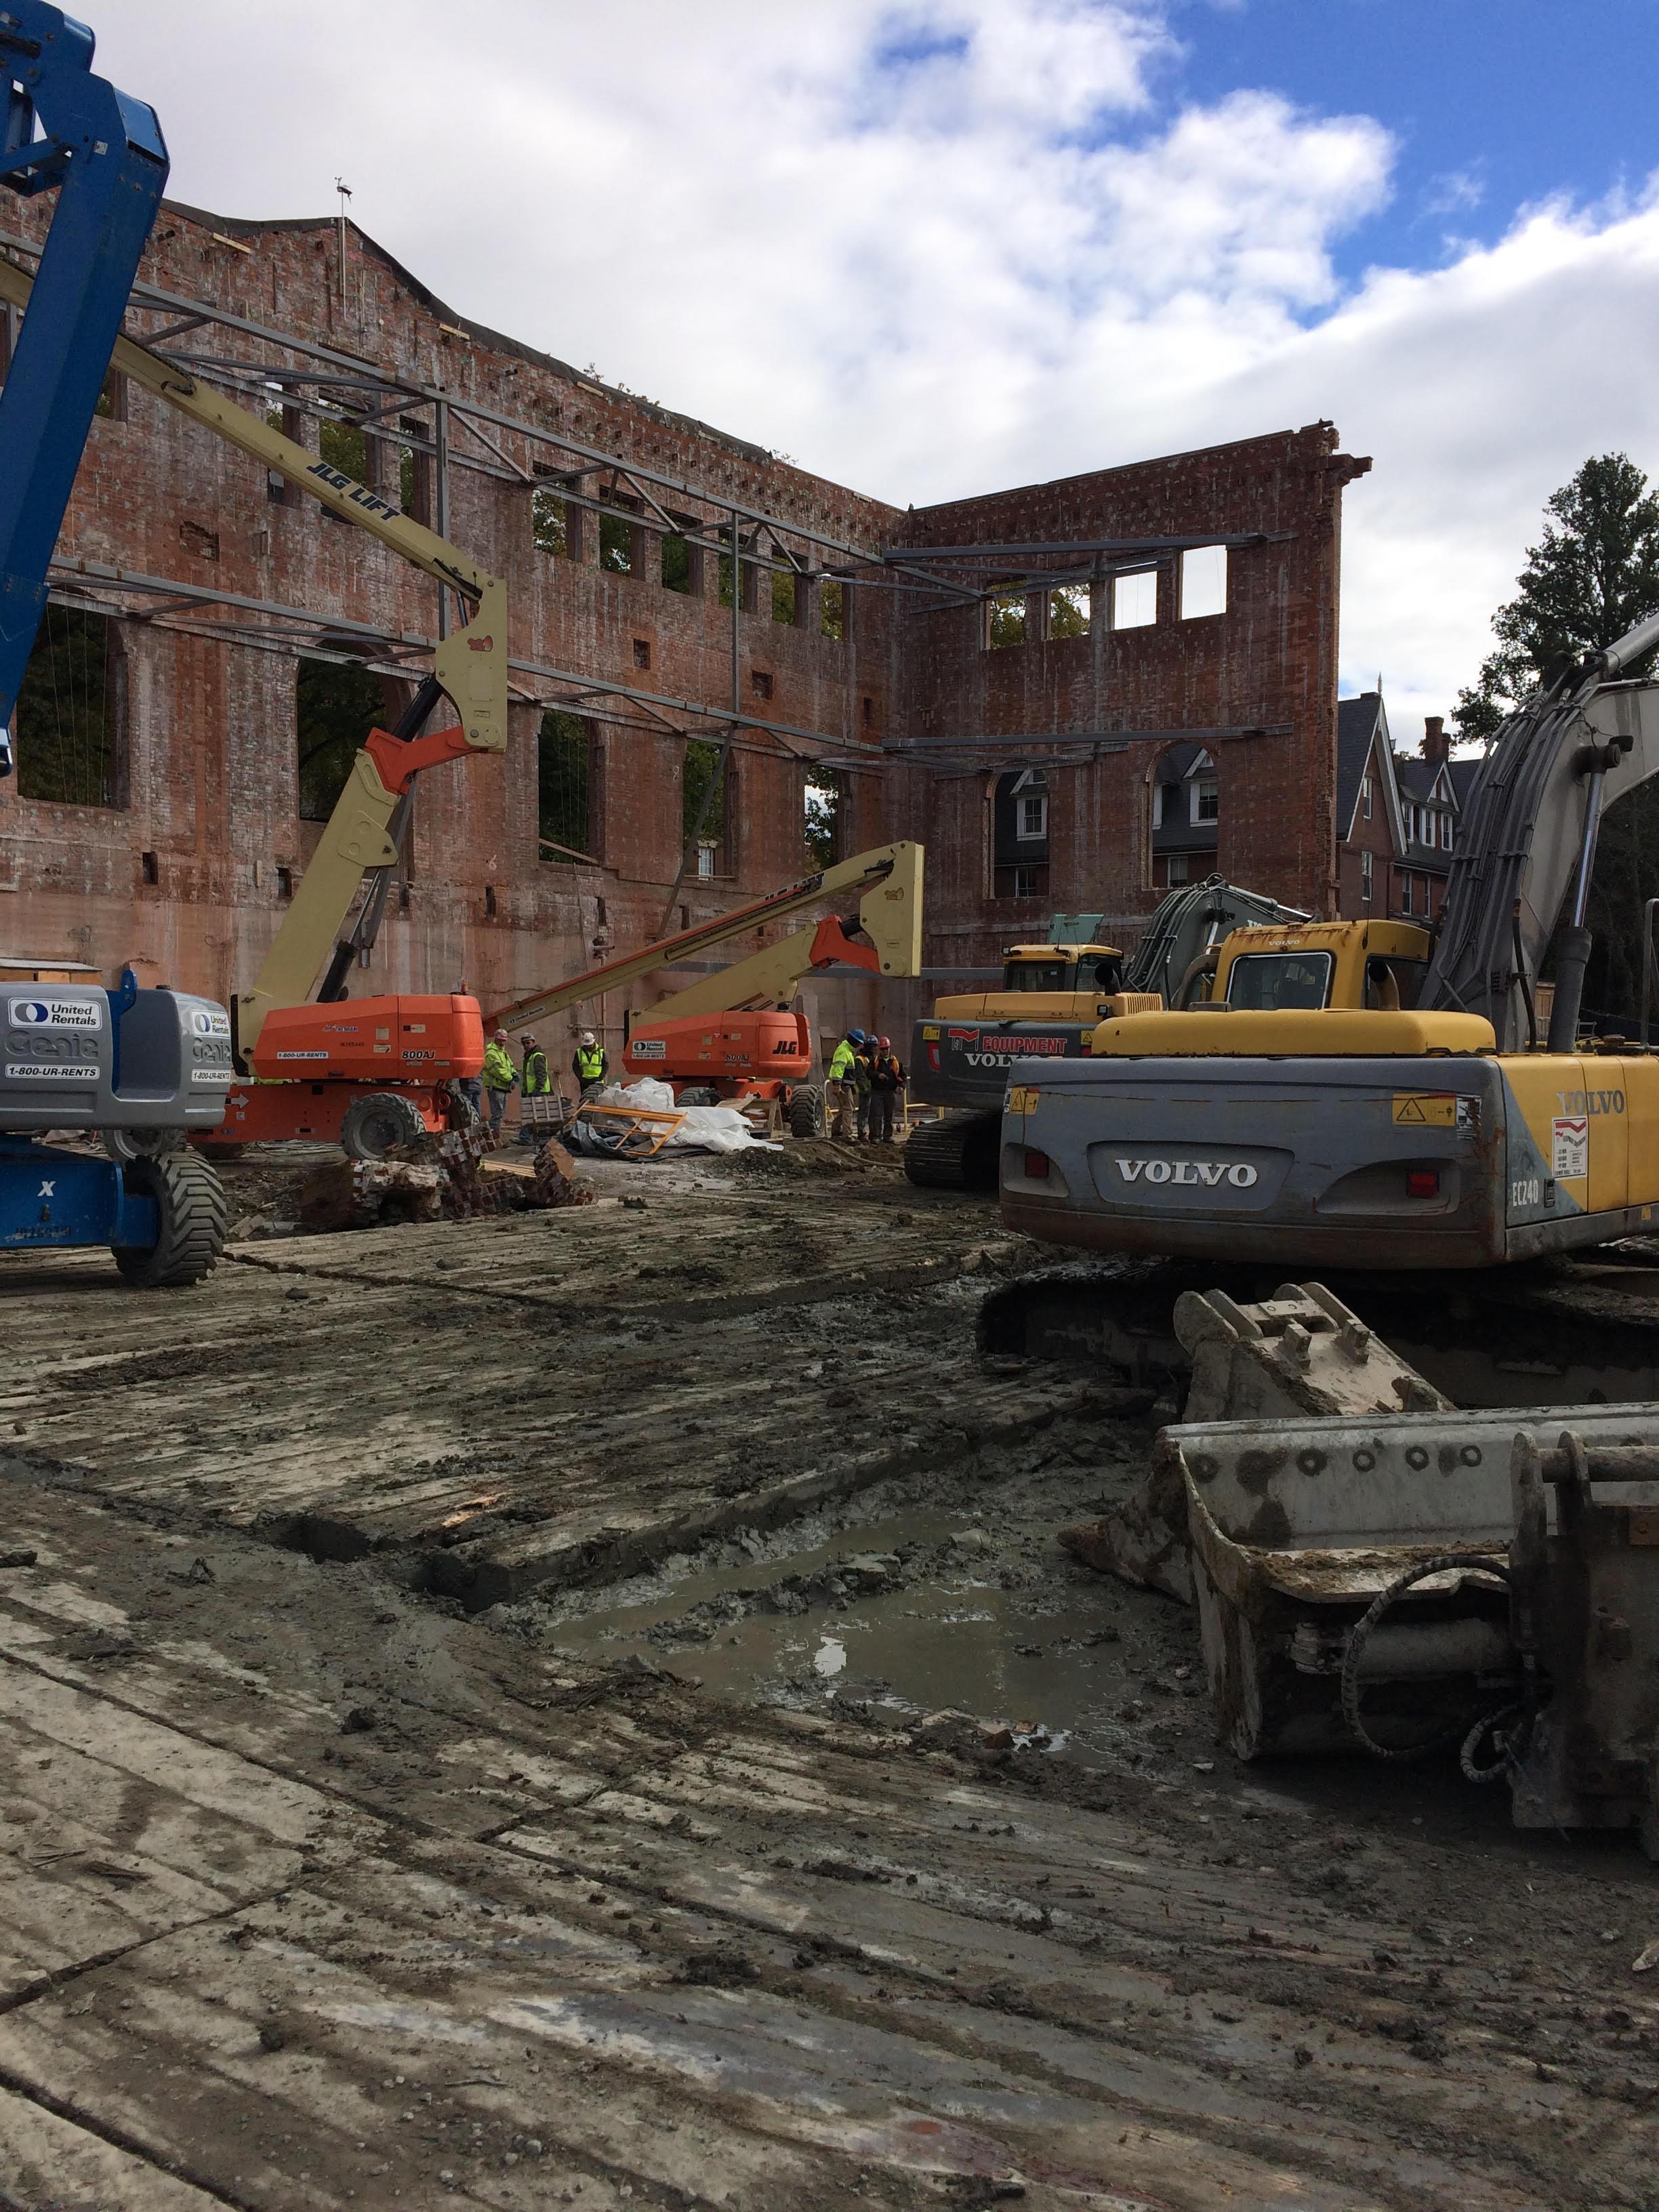 Construction site 1909 core November 2018